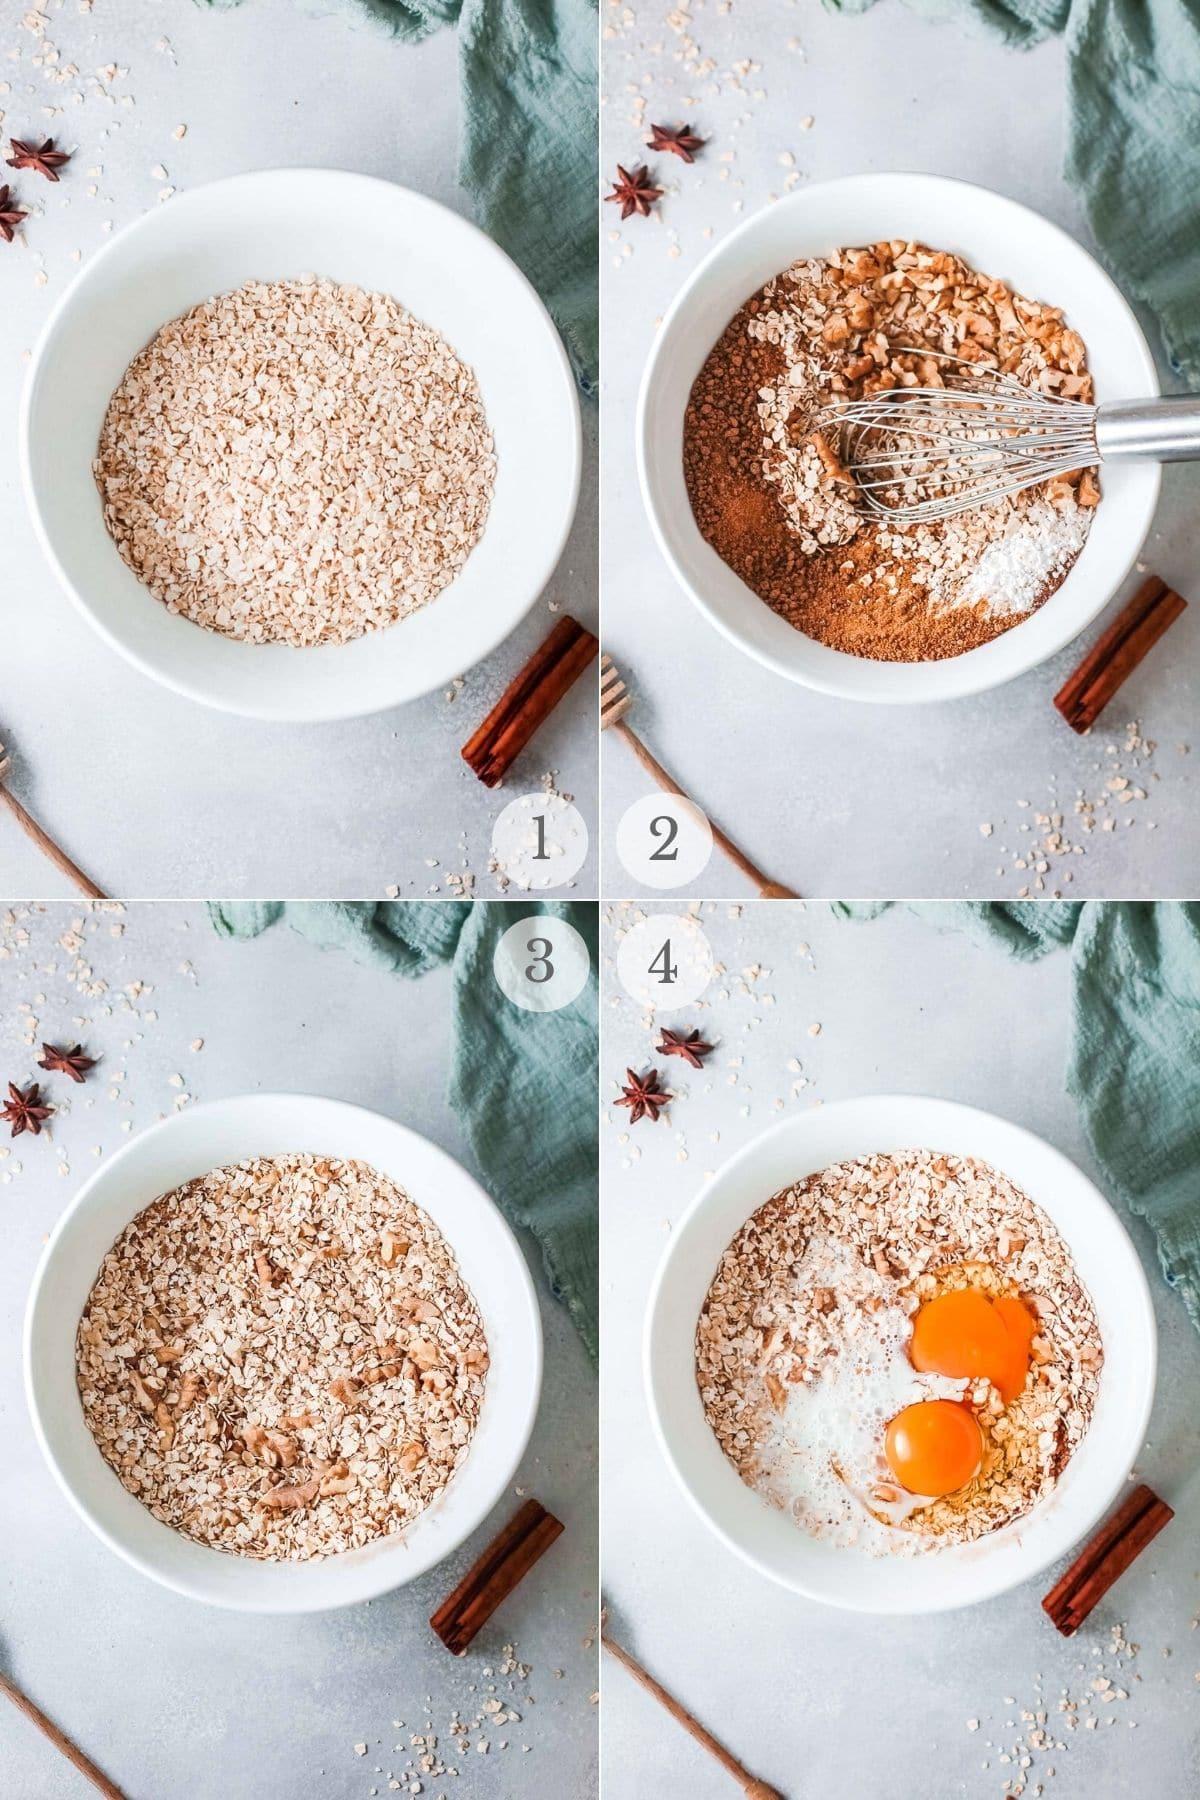 apple baked oatmeal recipe steps 1-4